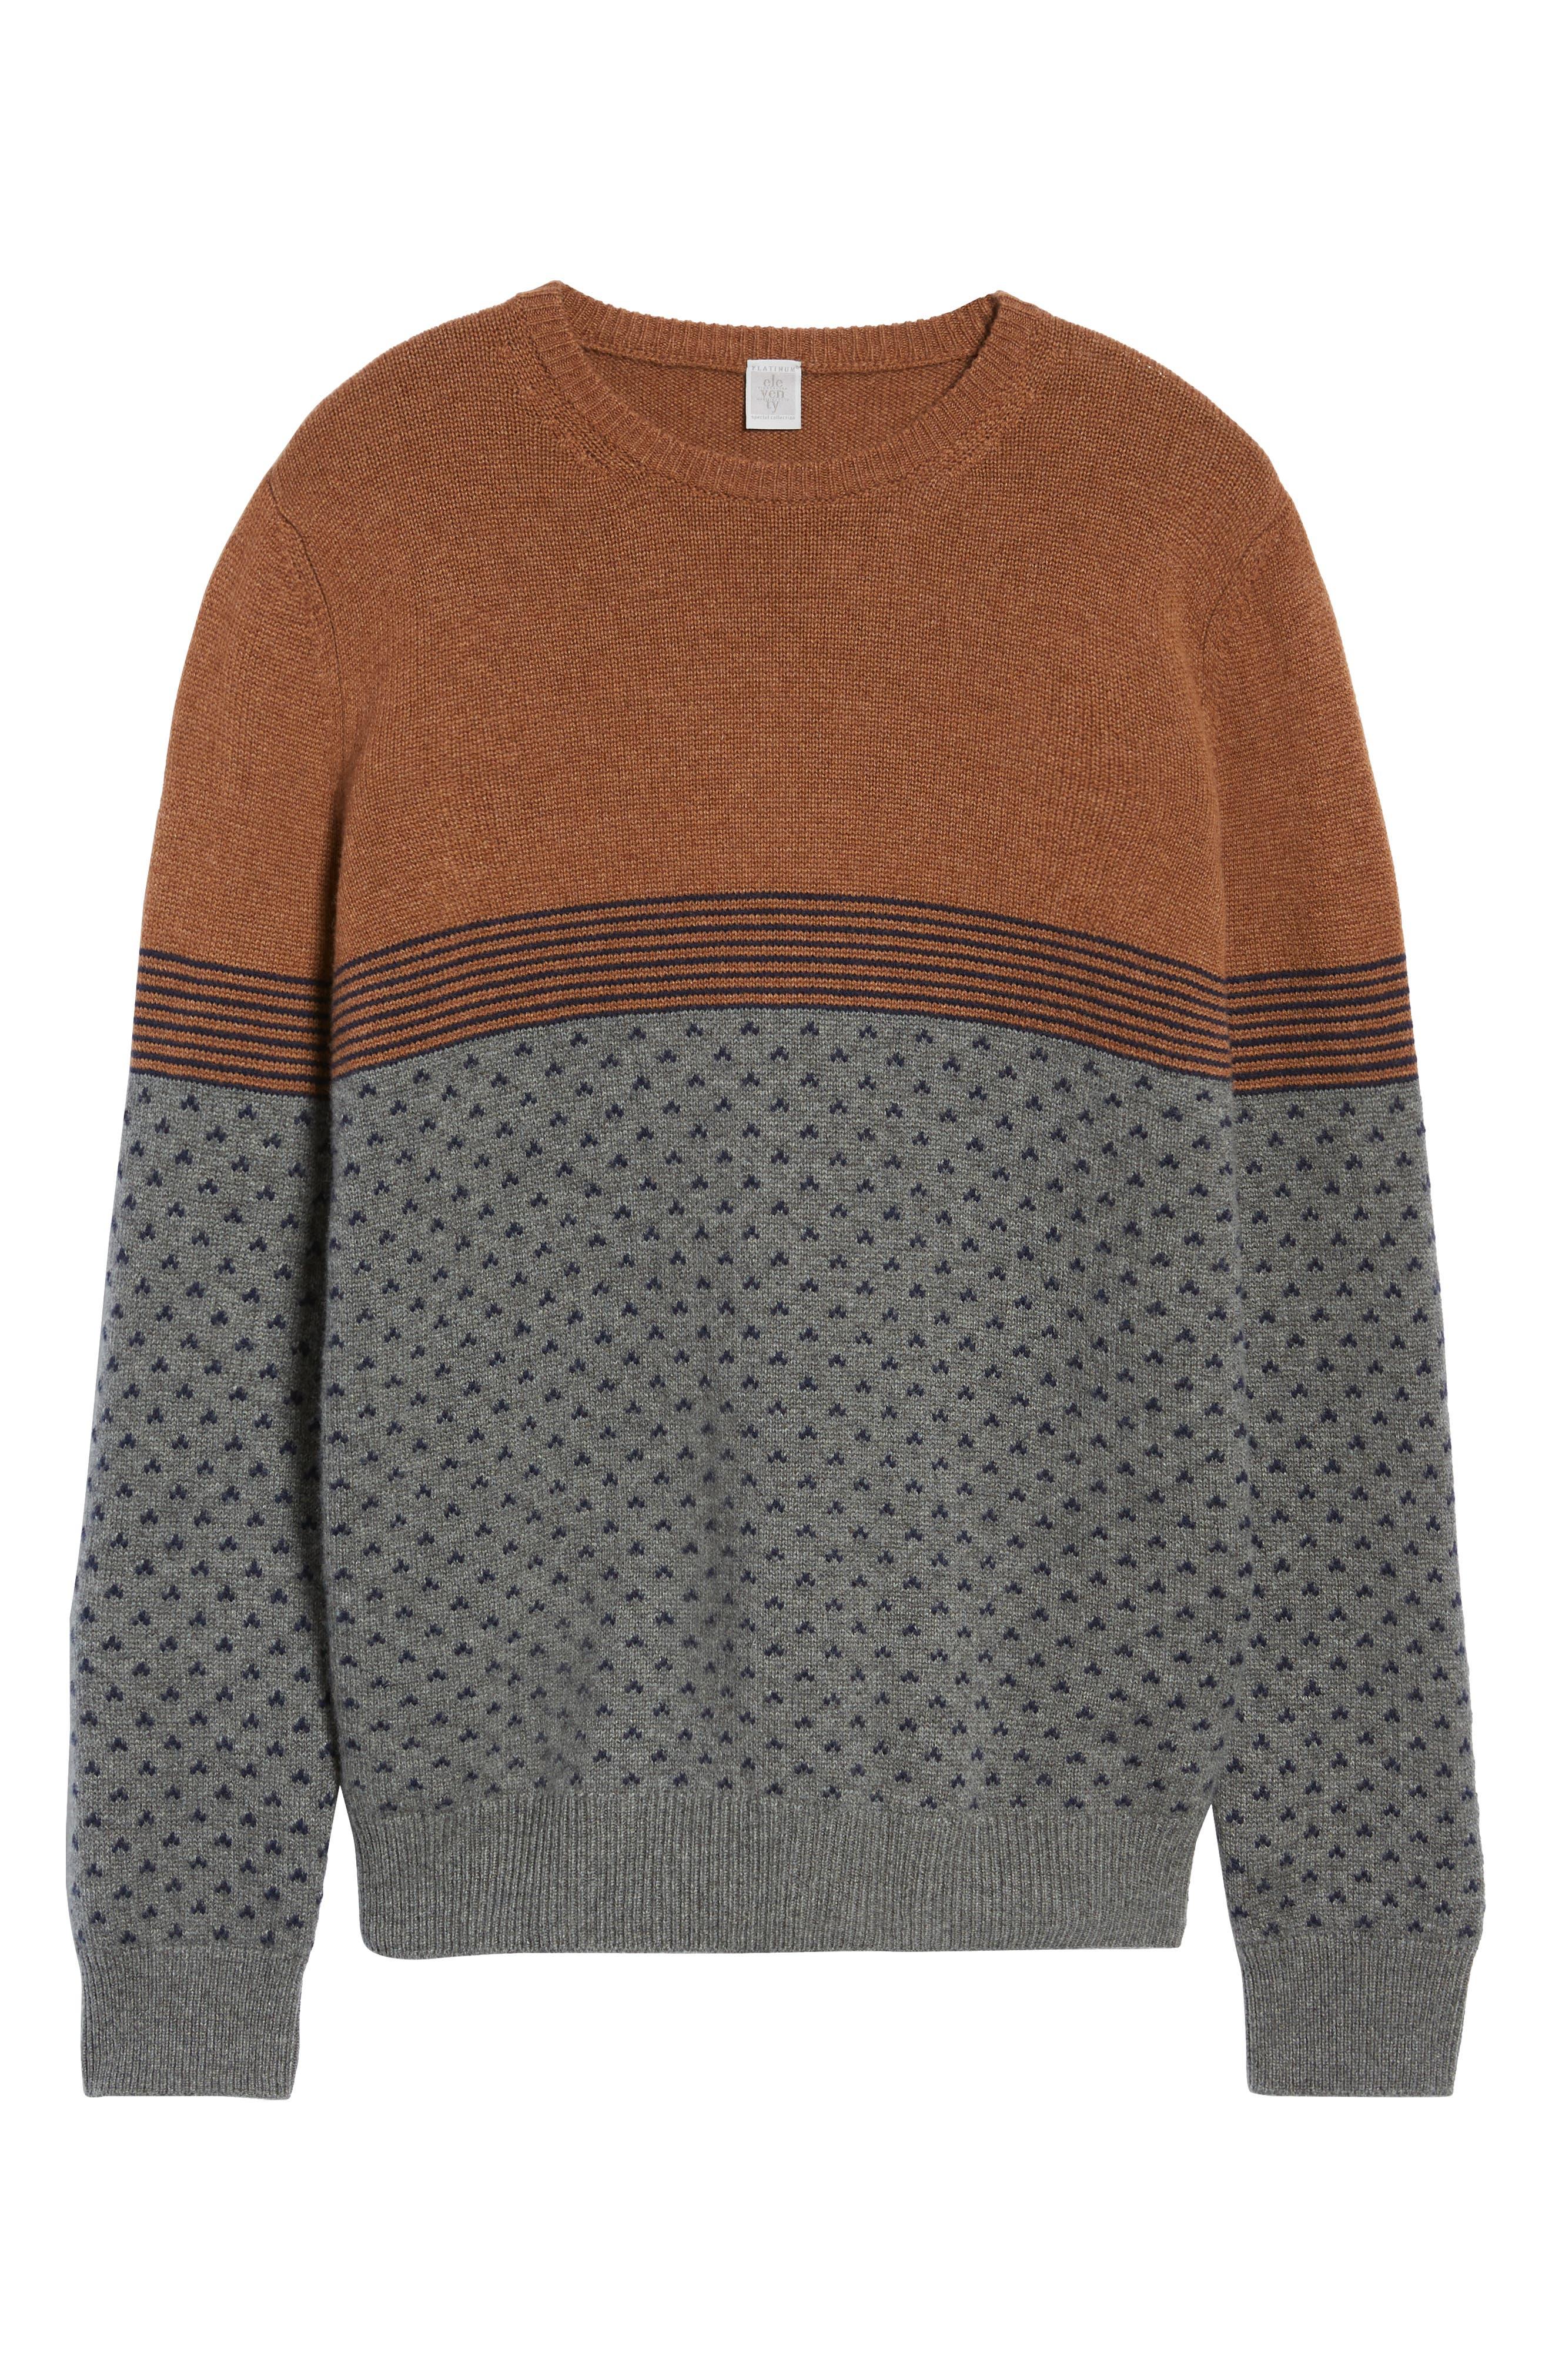 Trim Fit Cashmere Sweater,                             Alternate thumbnail 6, color,                             GREY